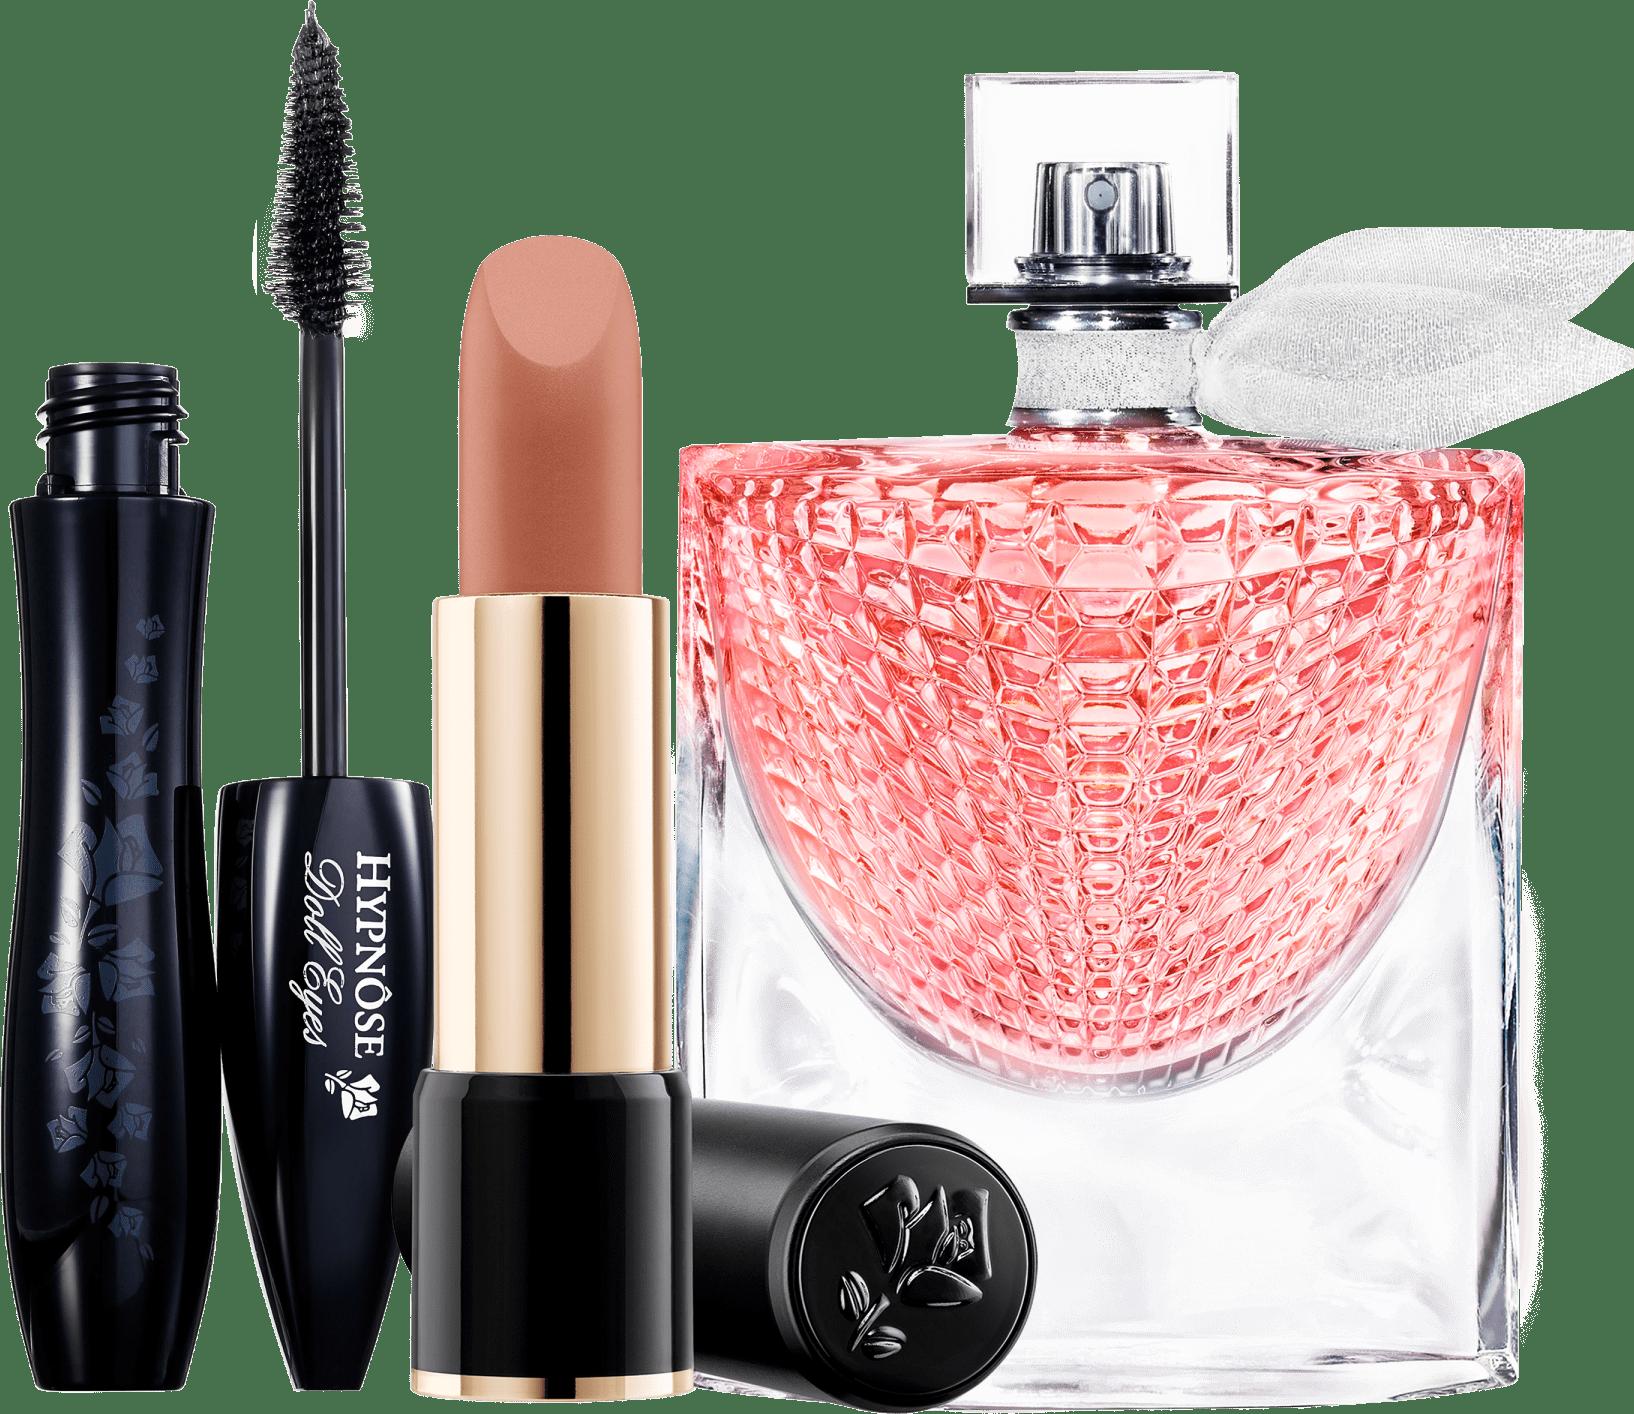 0627eec27 Kit Lancôme Mulher Radiante e Sofisticada   Beleza na Web